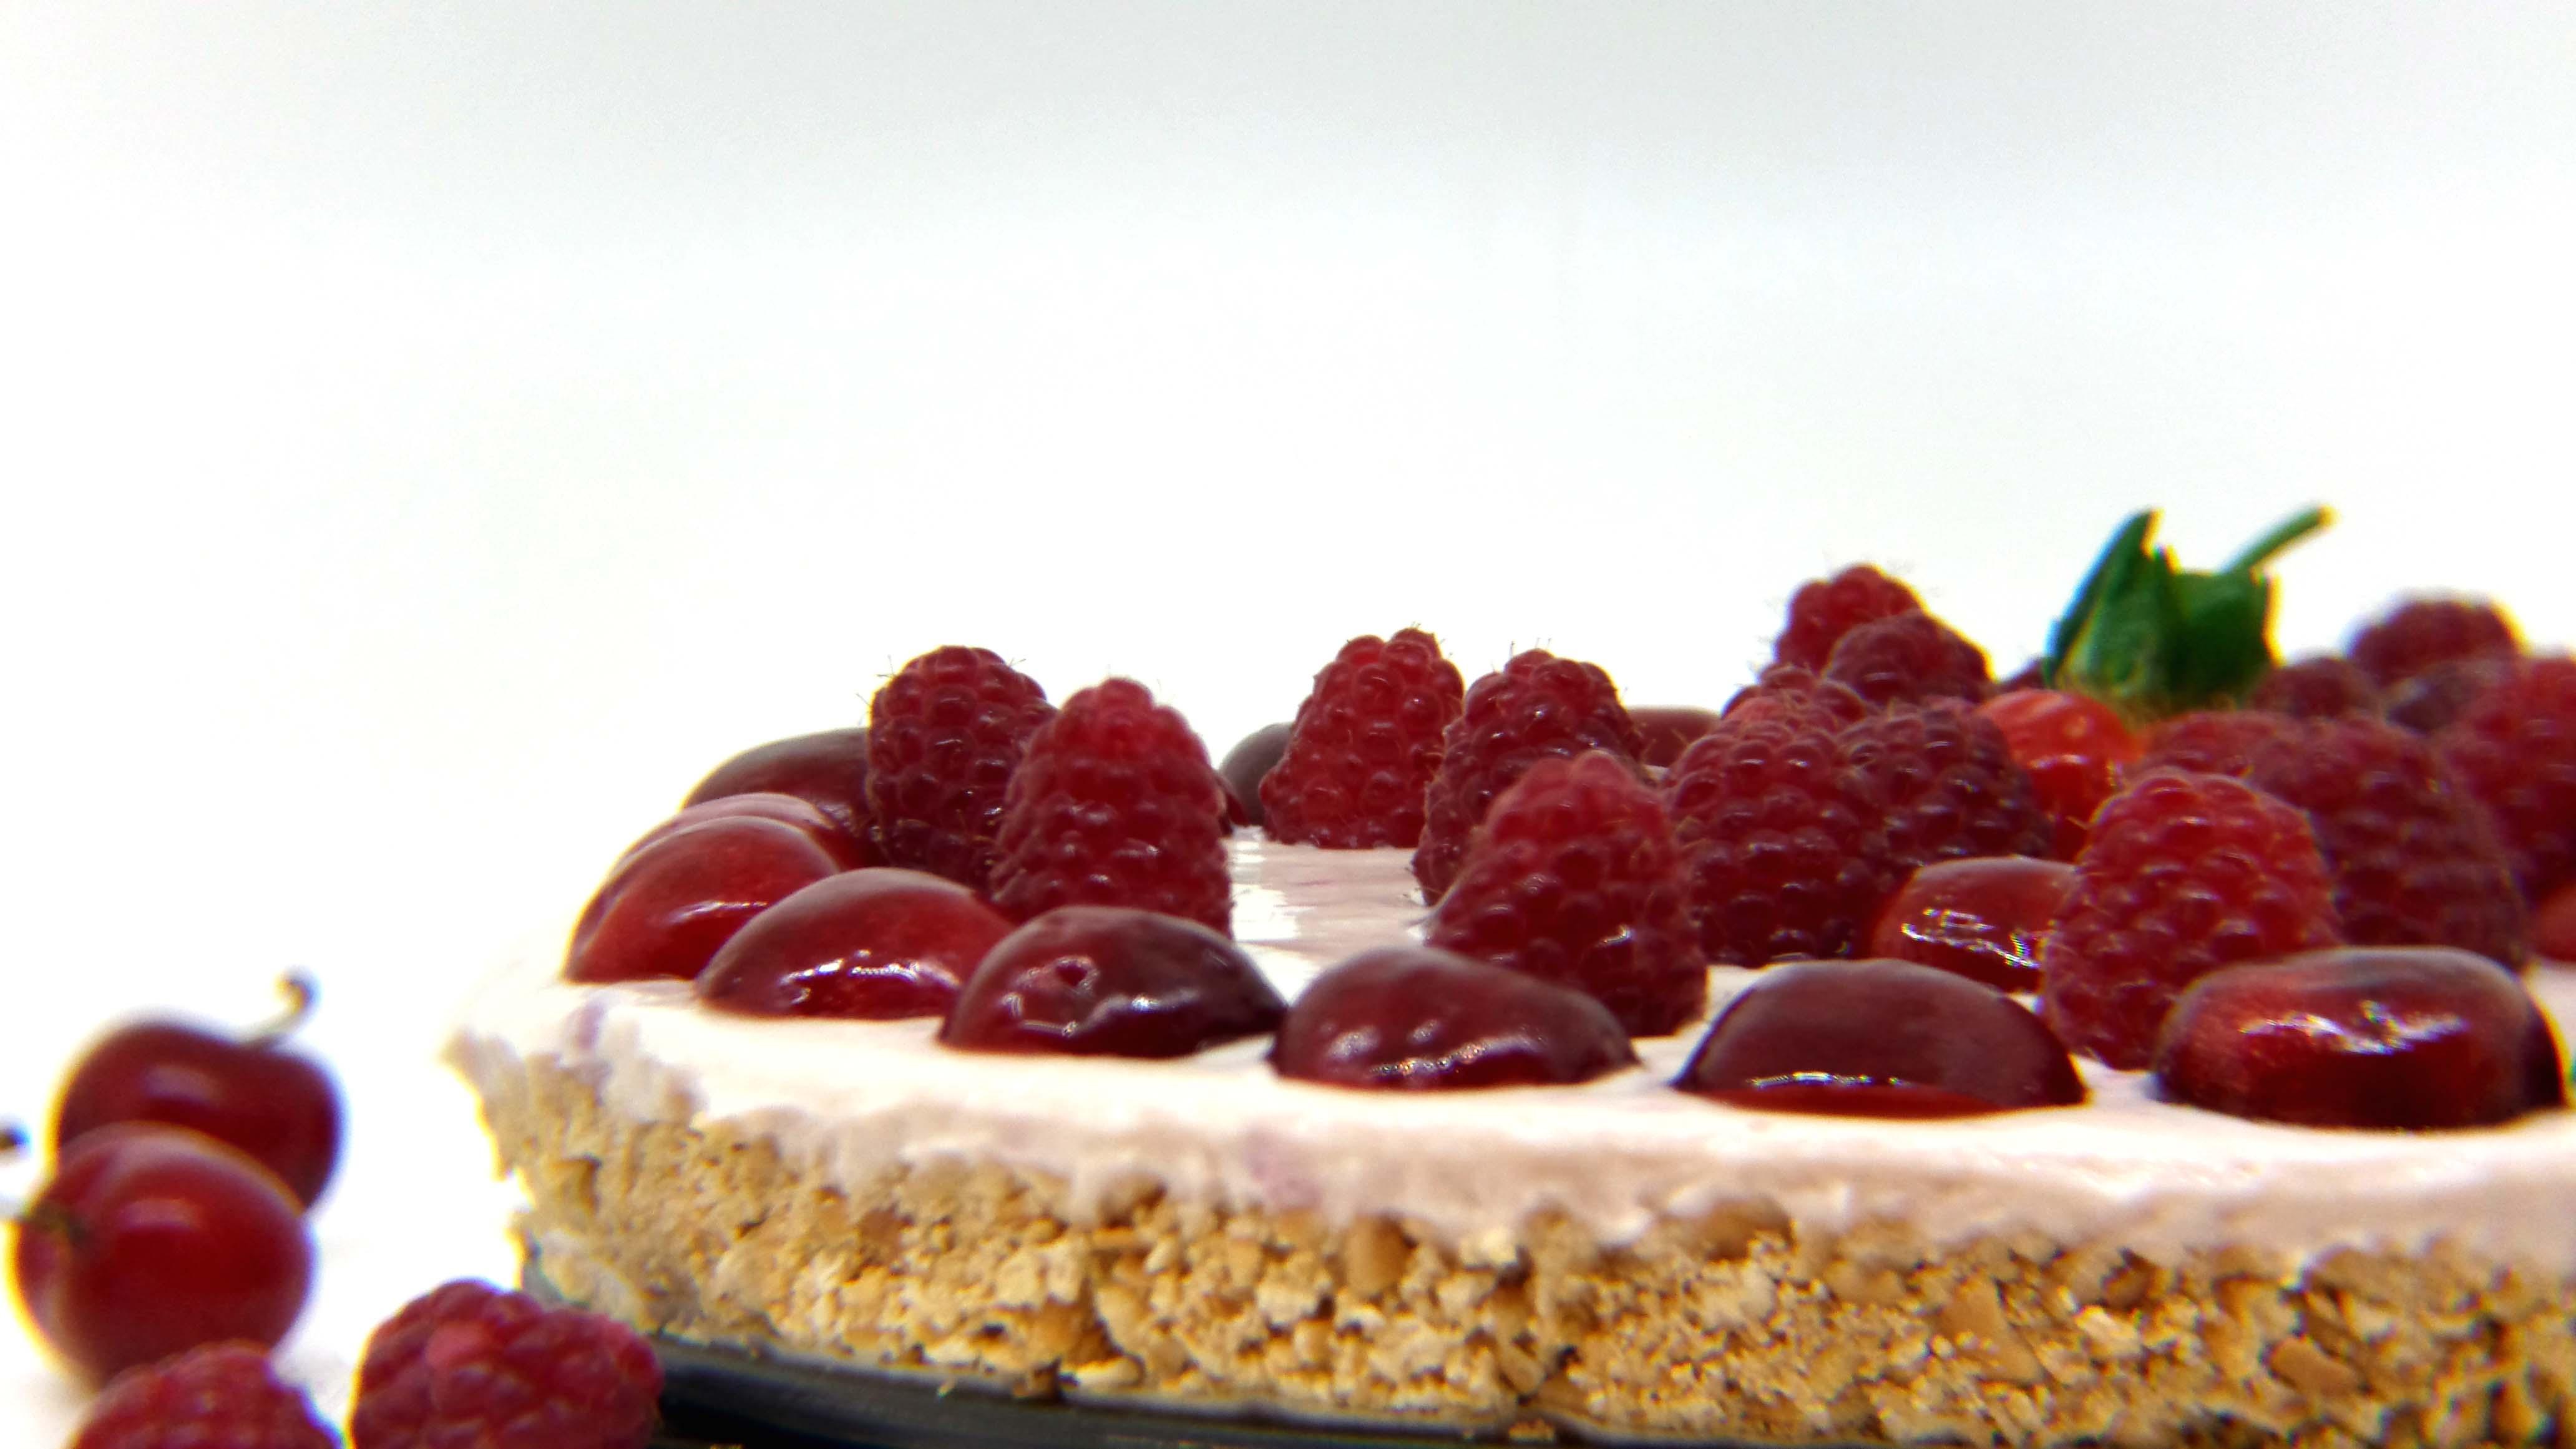 Cheesecake fredda senza gelatina e senza panna